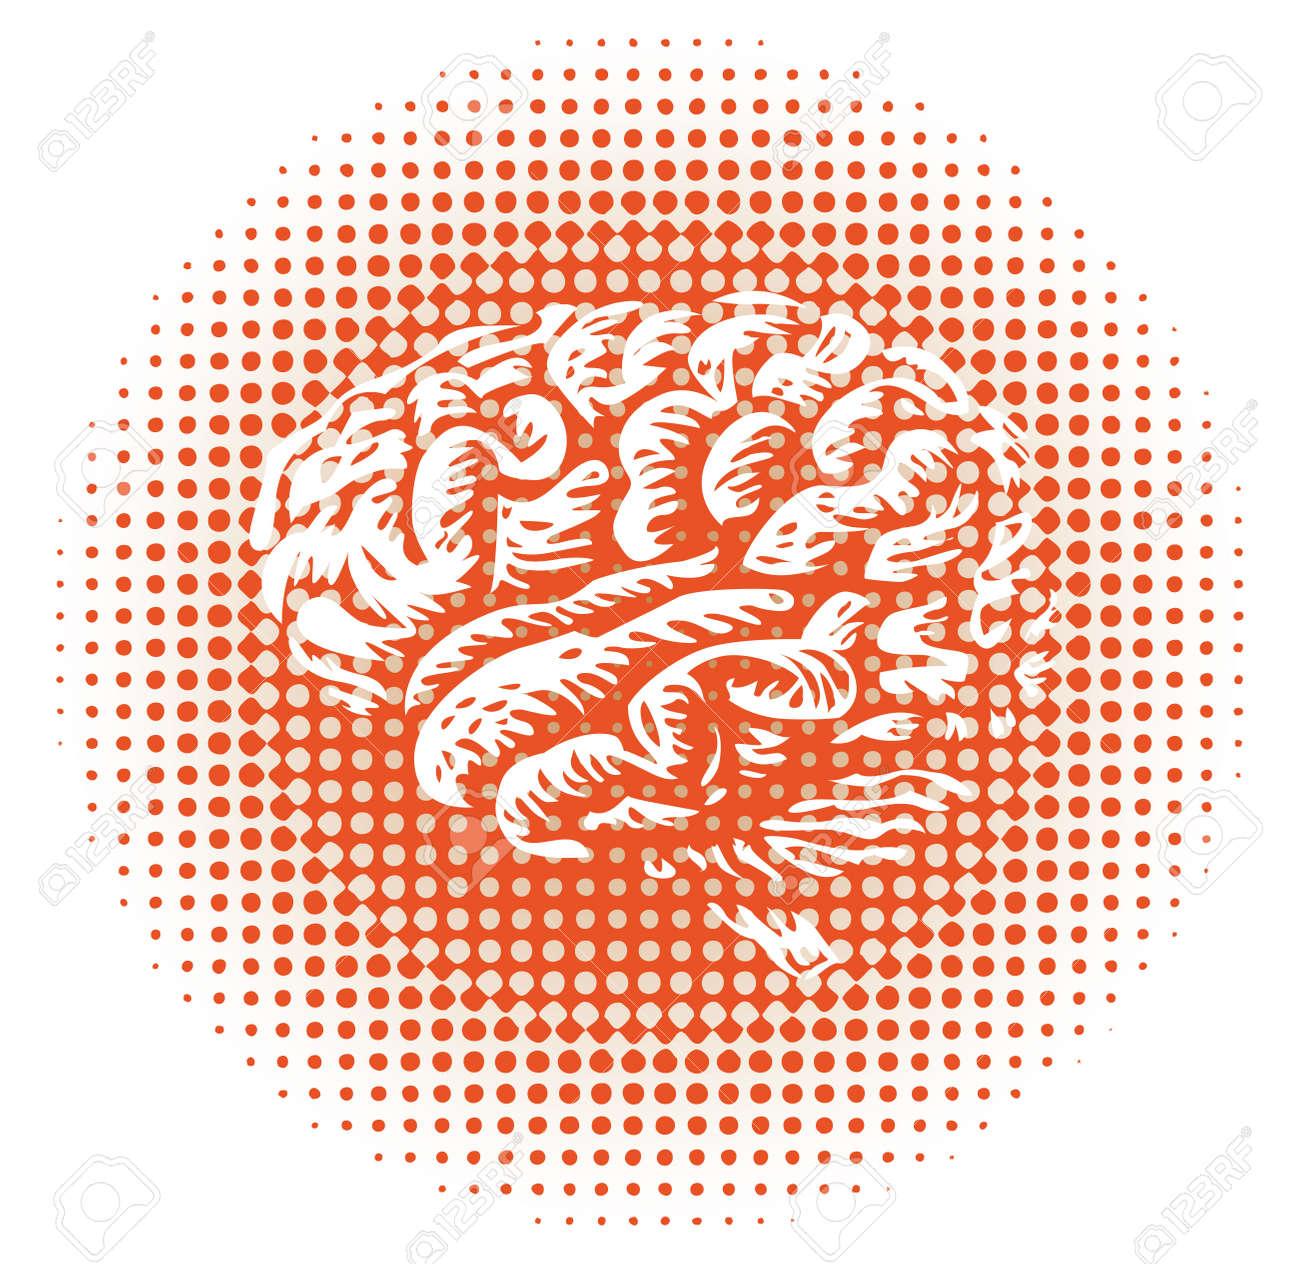 whole human brain isolated - illustration Stock Vector - 14698703